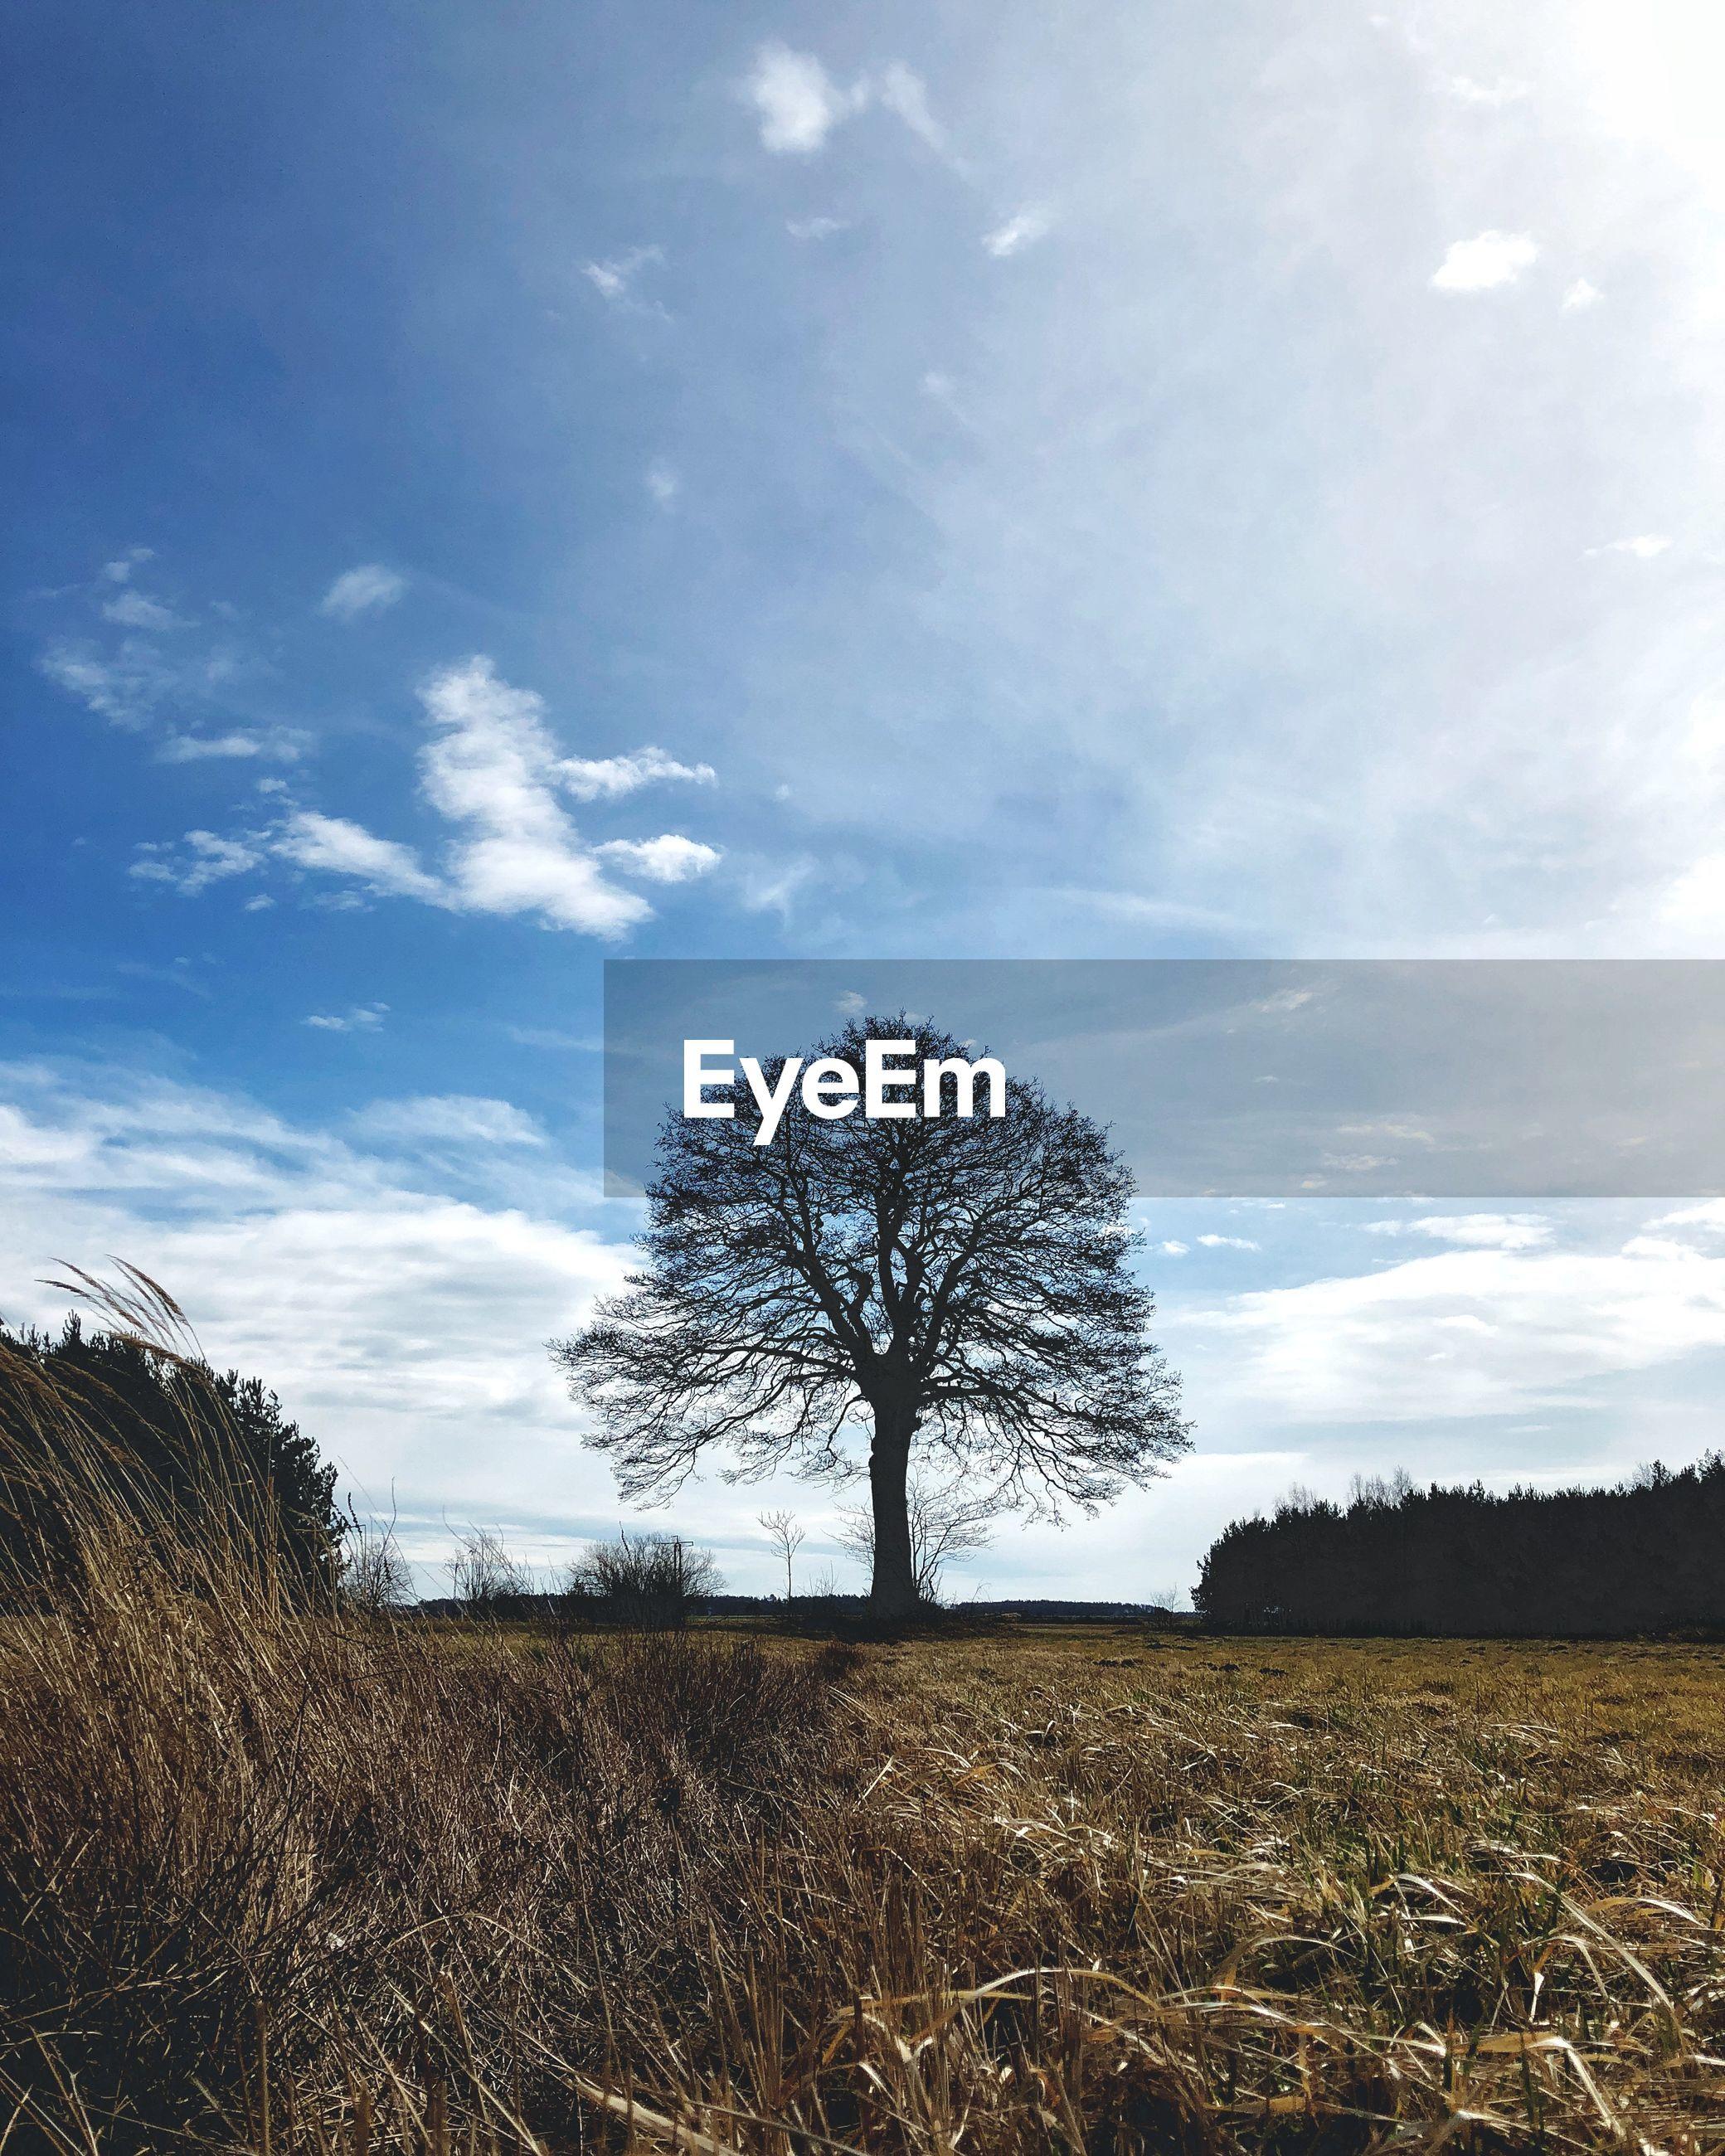 BARE TREE IN FIELD AGAINST SKY